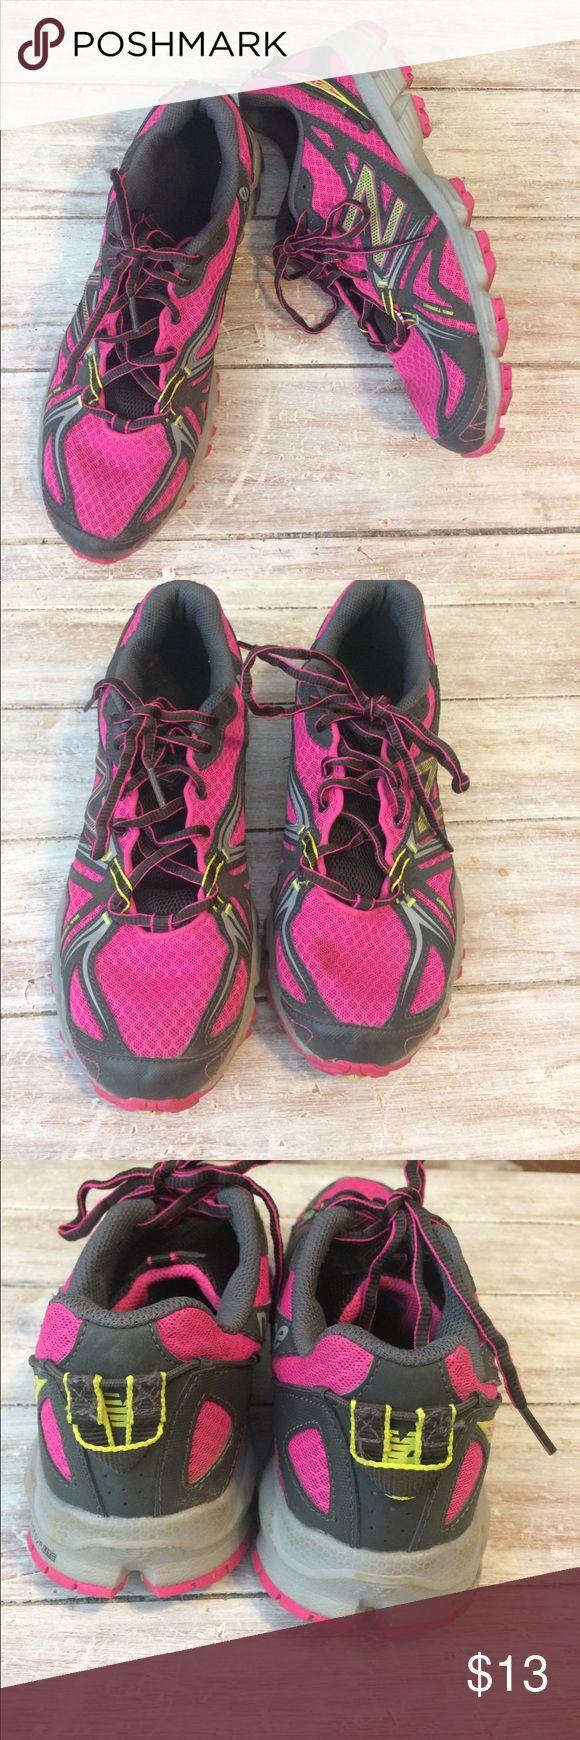 New balance all terrain shoe Pink new balance all terrain tennis shoe New Balance Shoes Athletic Shoes